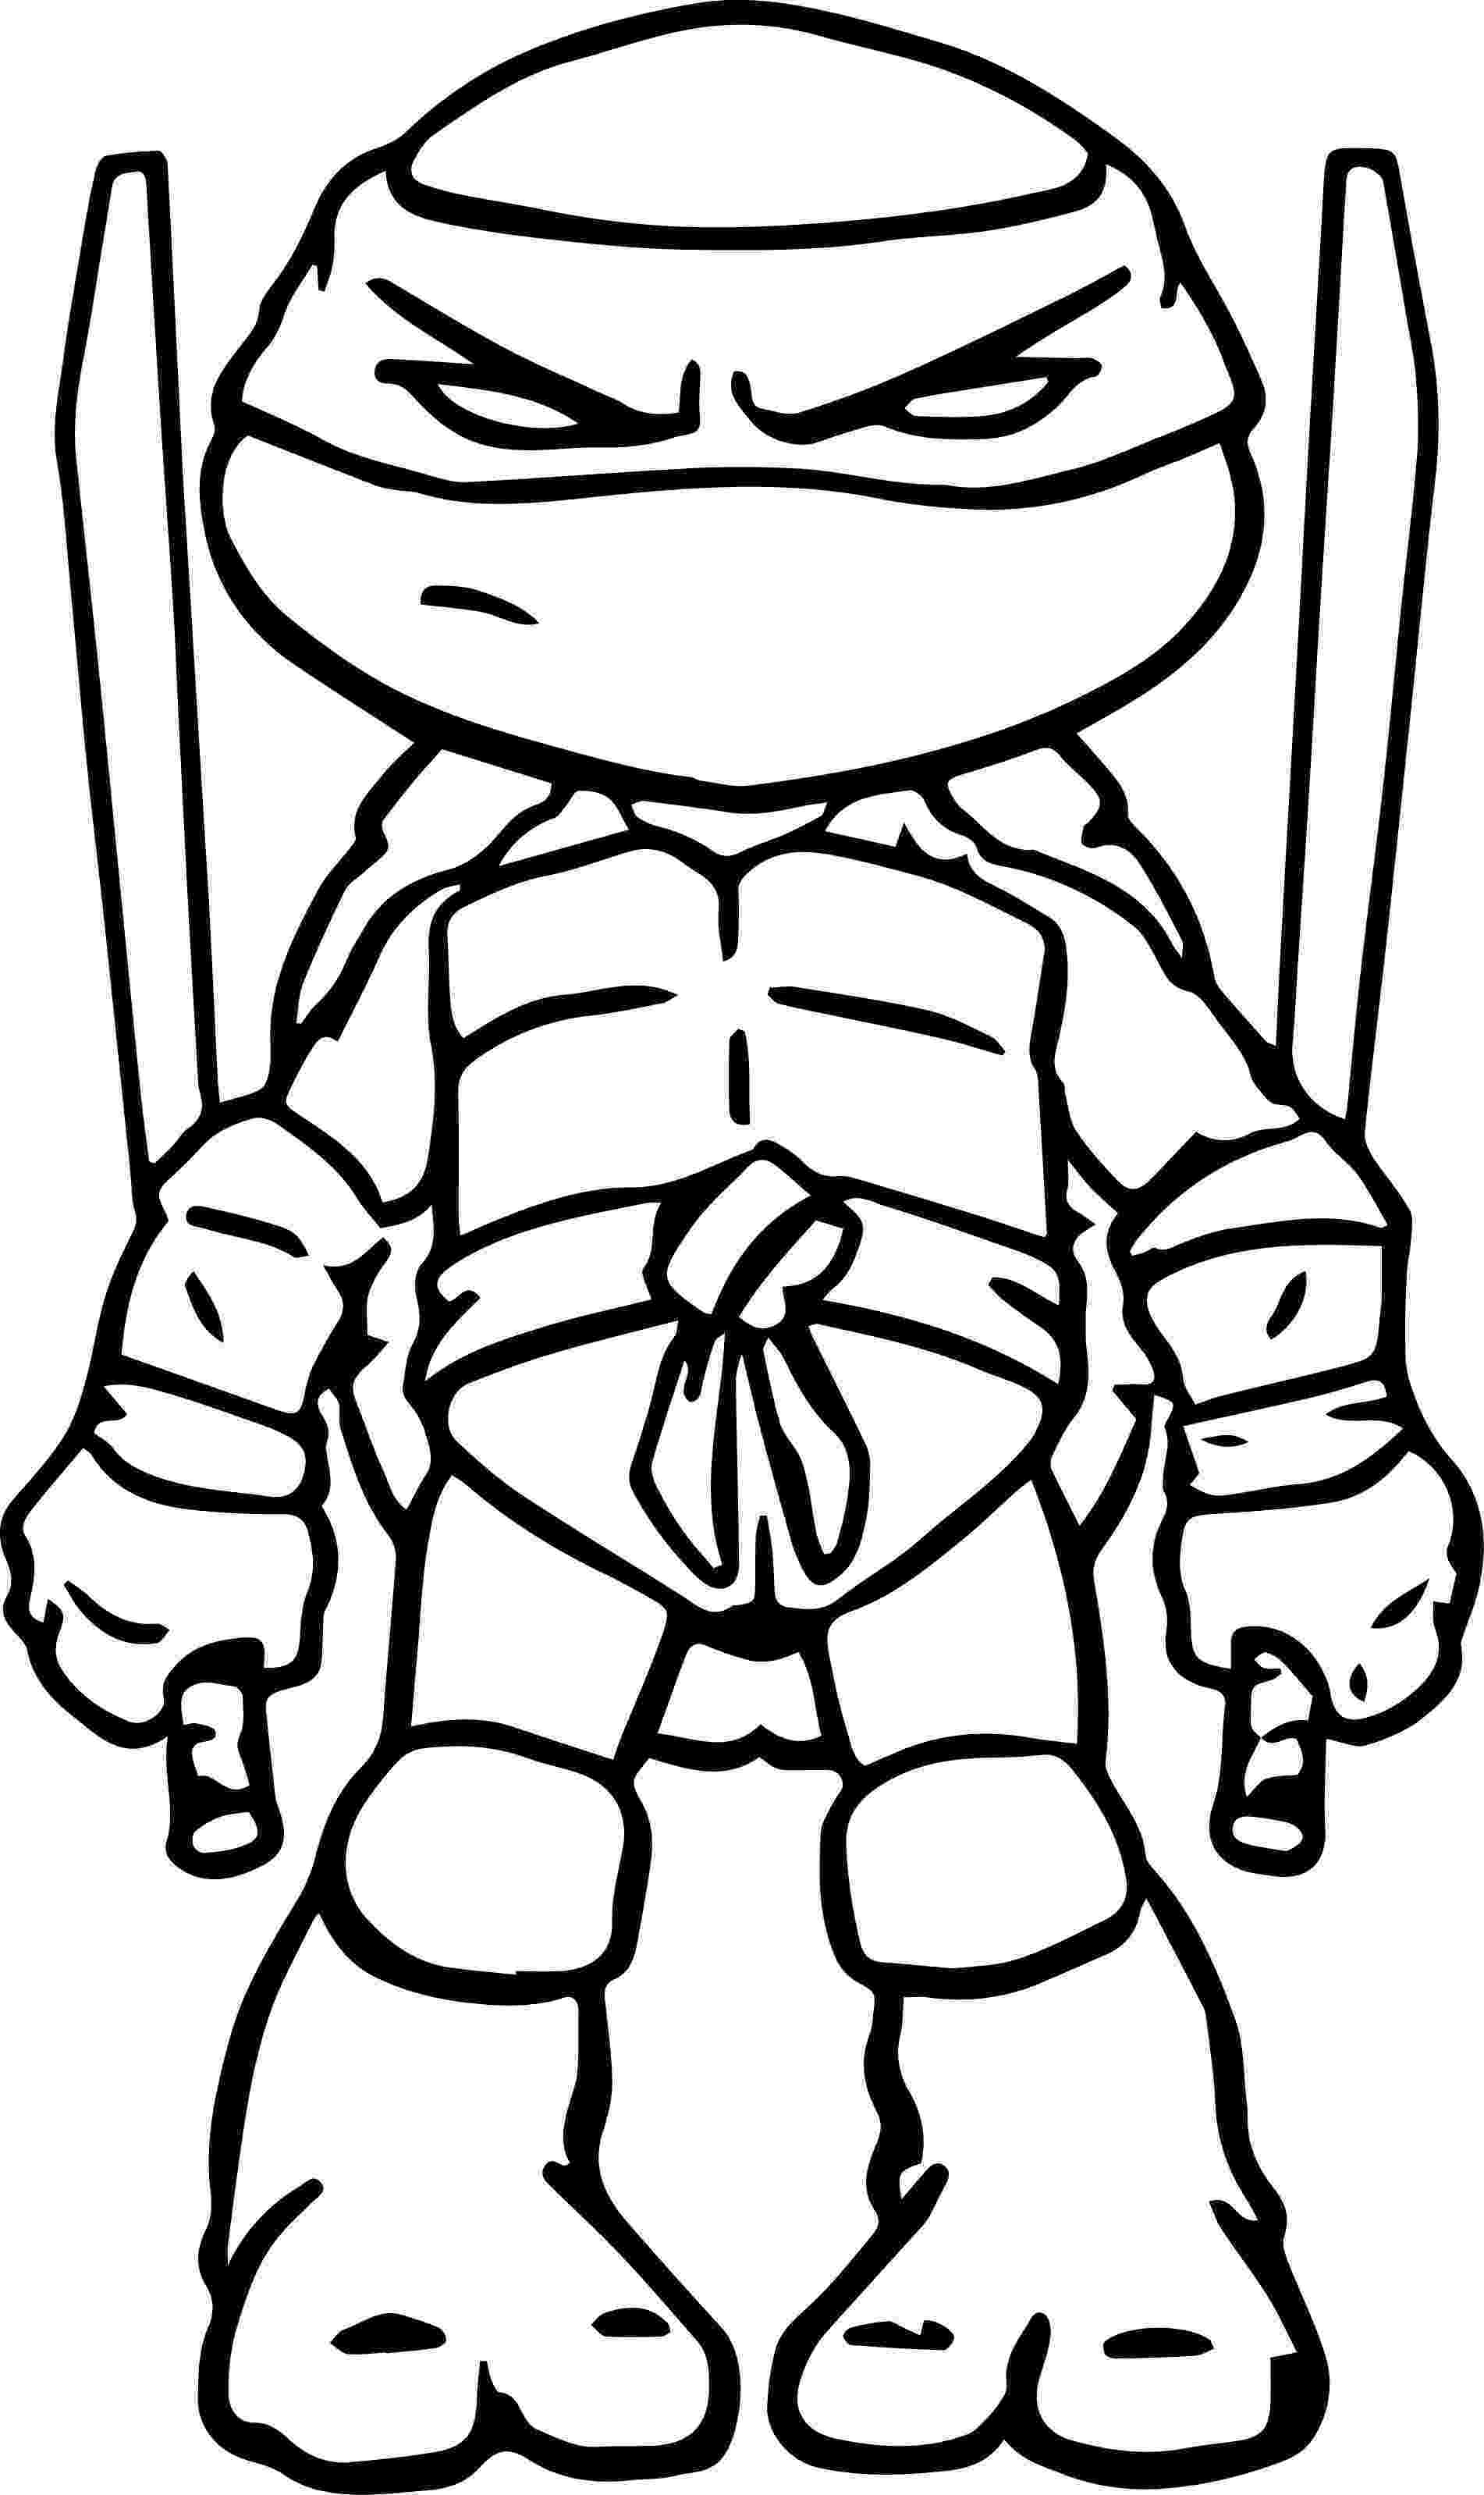 ninja turtle coloring page craftoholic teenage mutant ninja turtles coloring pages page ninja turtle coloring